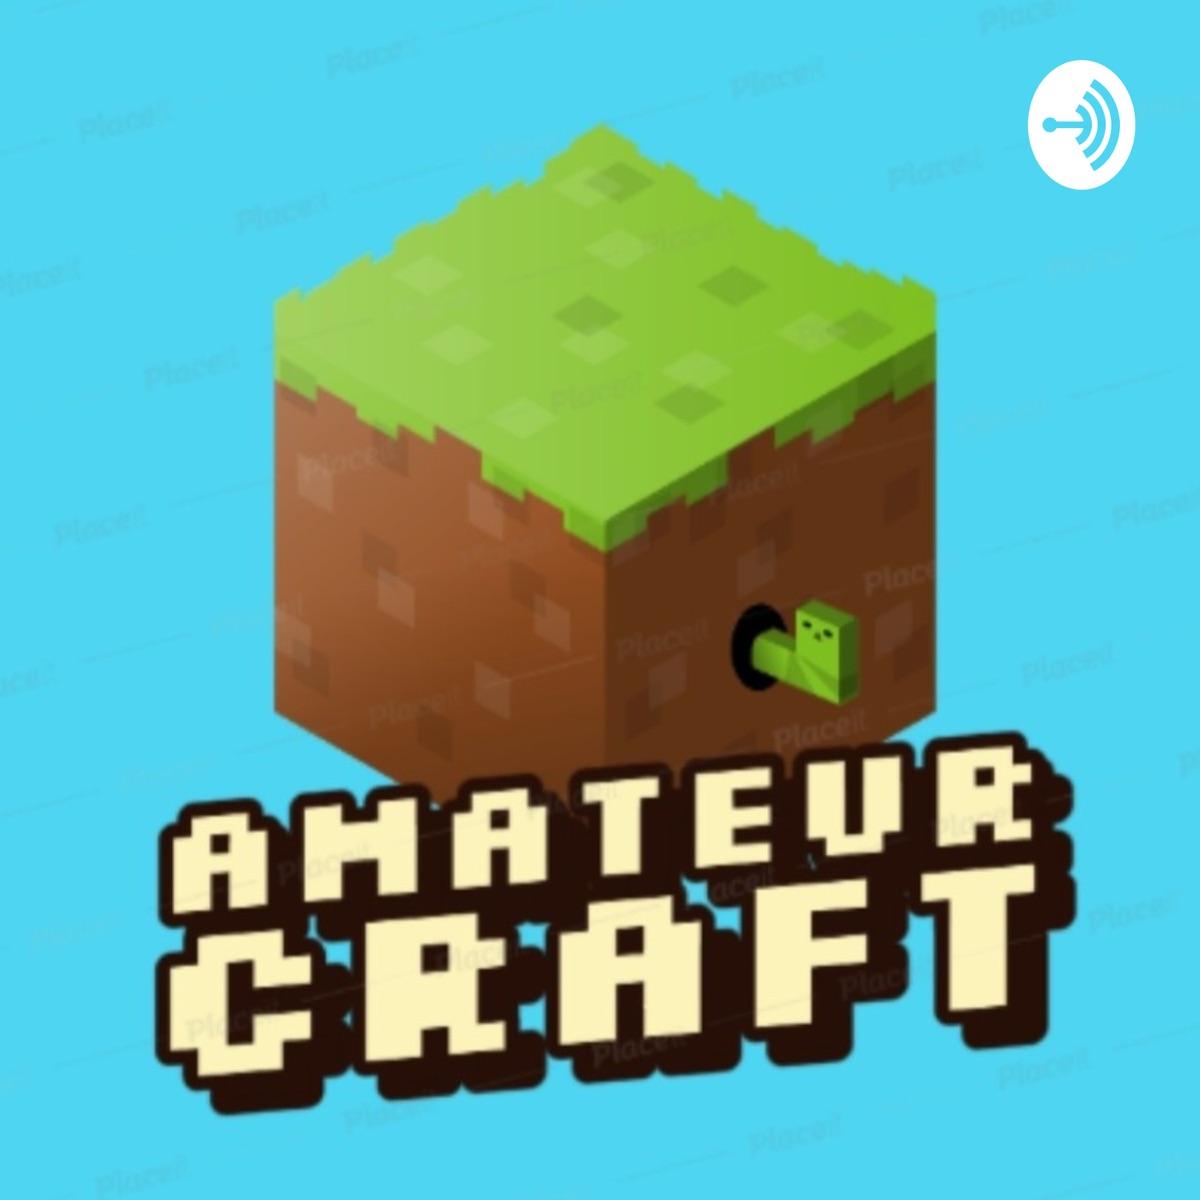 Amateurcraft